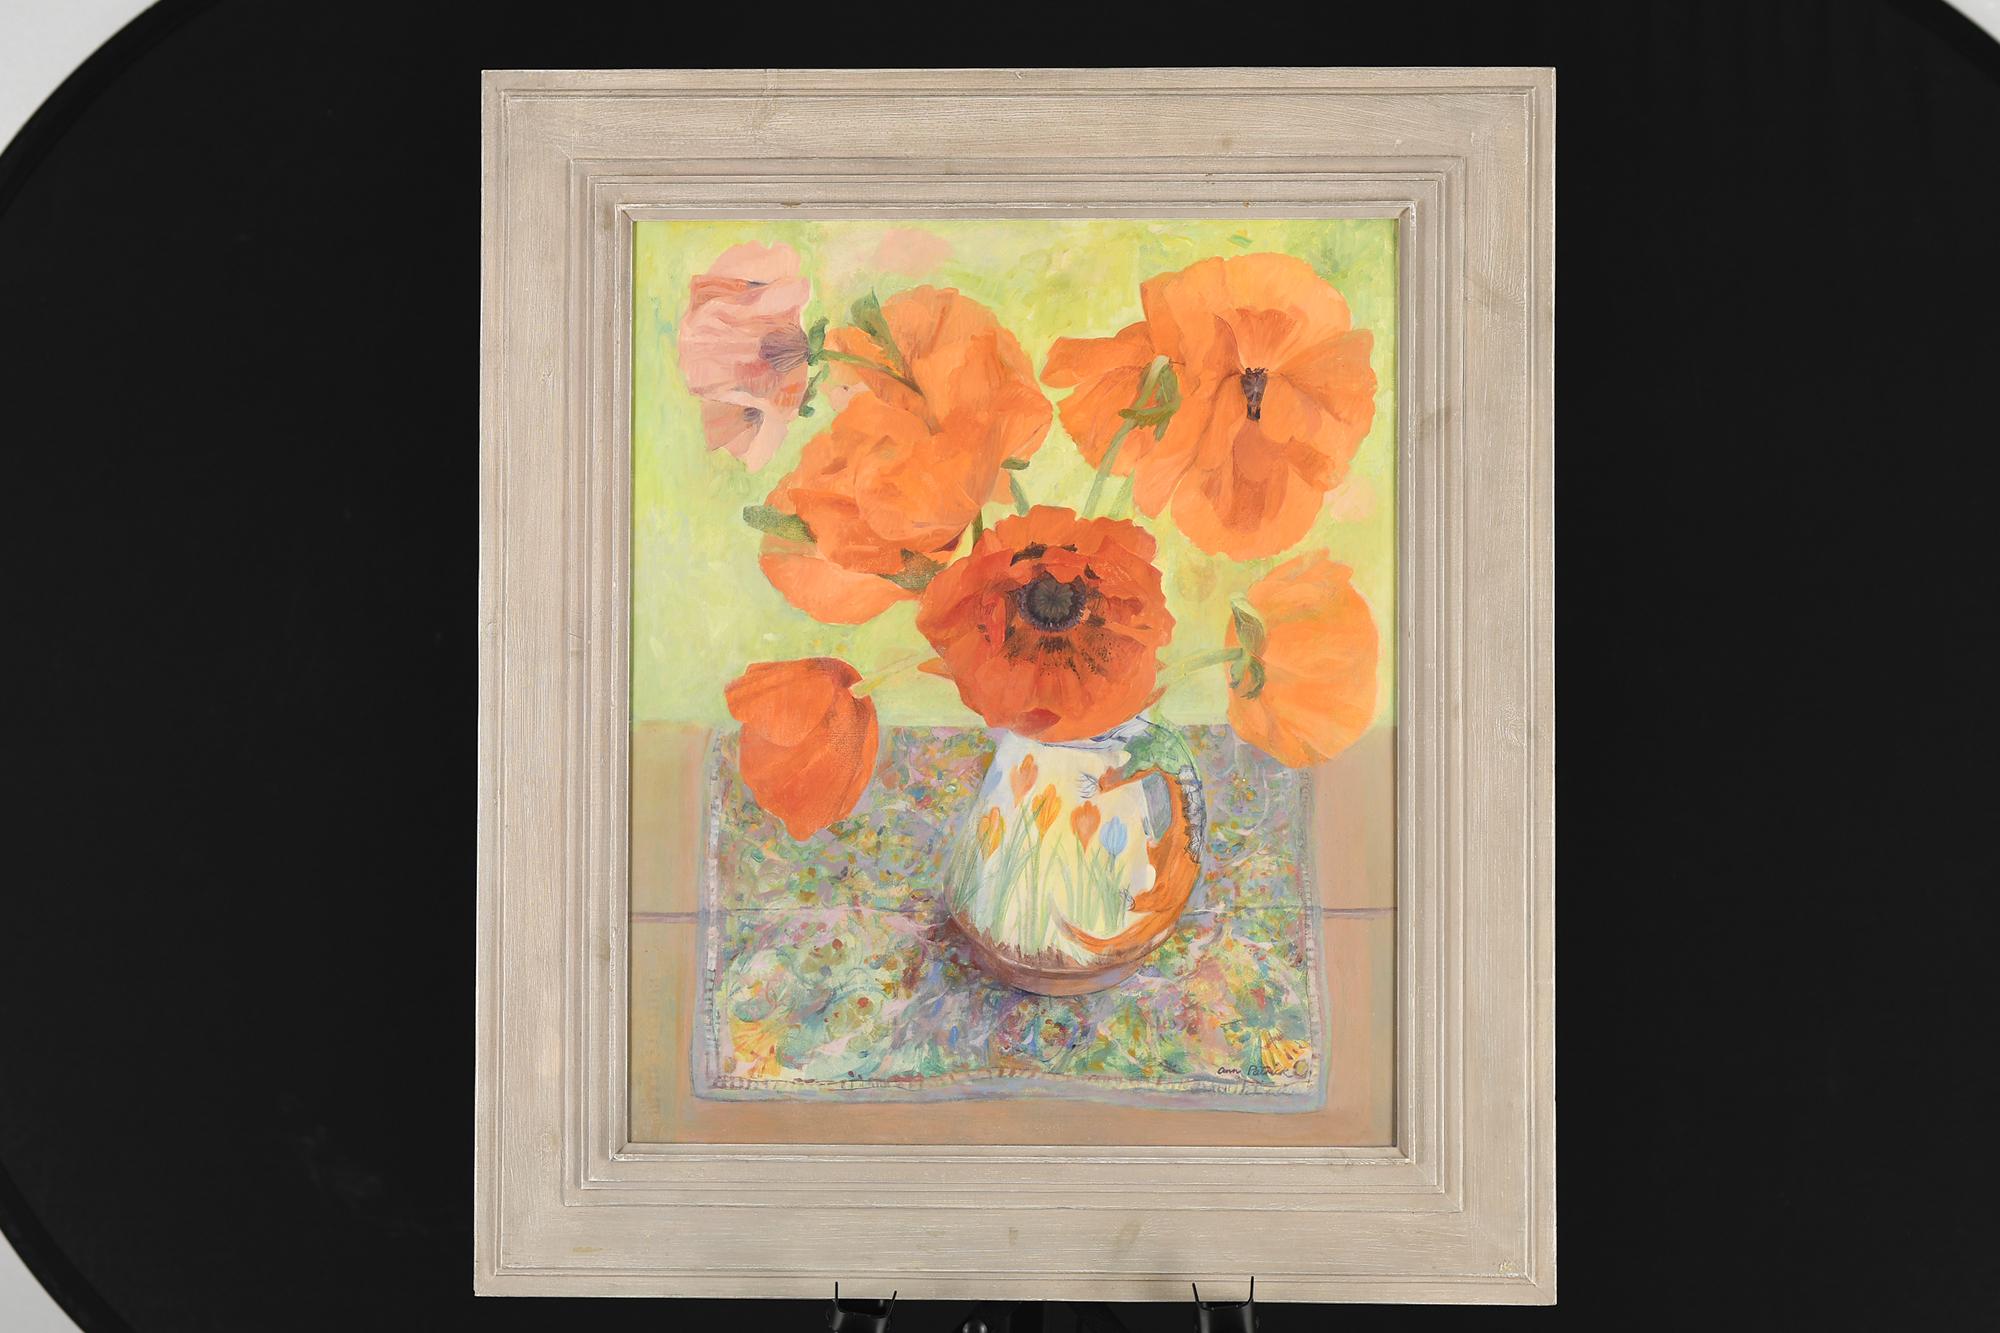 Original Oil Painting by Scottish Artist Ann Patrick.